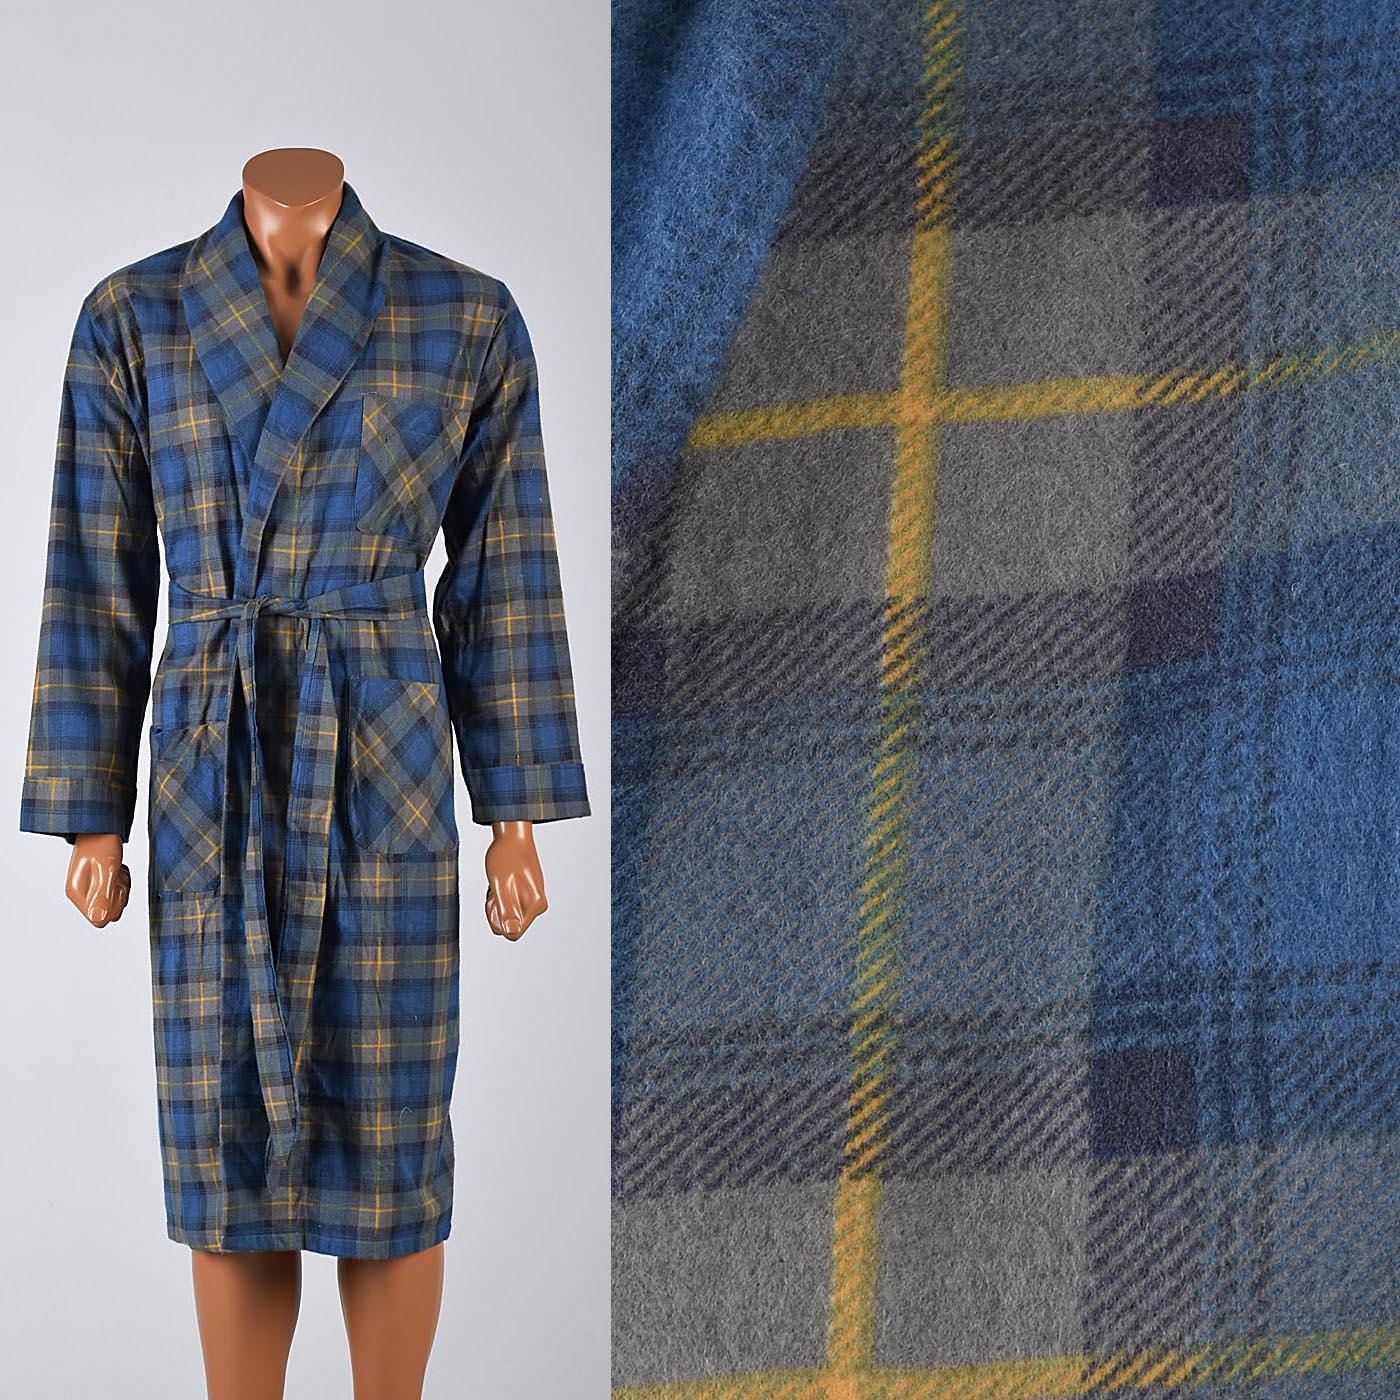 4fc1c477bbd3 Details about M Vintage Deadstock 1960s 60s Mens Robe Cotton Flannel Blue  Green Plaid Lounge